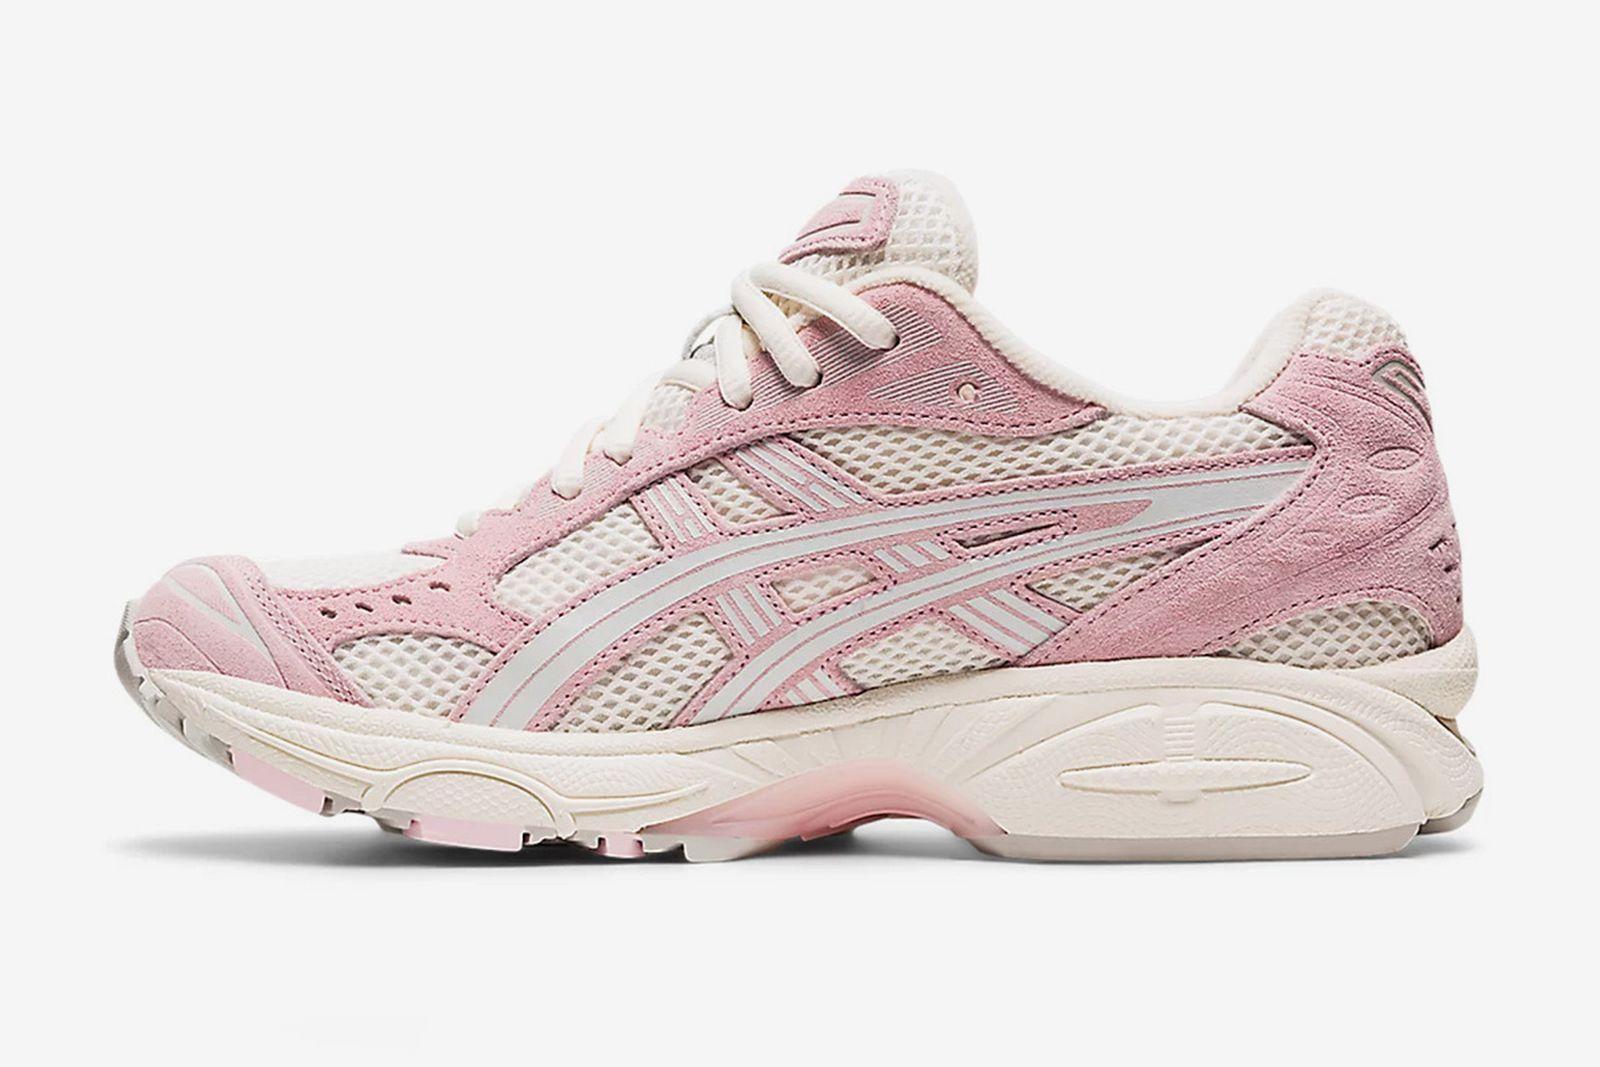 asics-gel-kayano-14-pink-salt-release-date-price-02